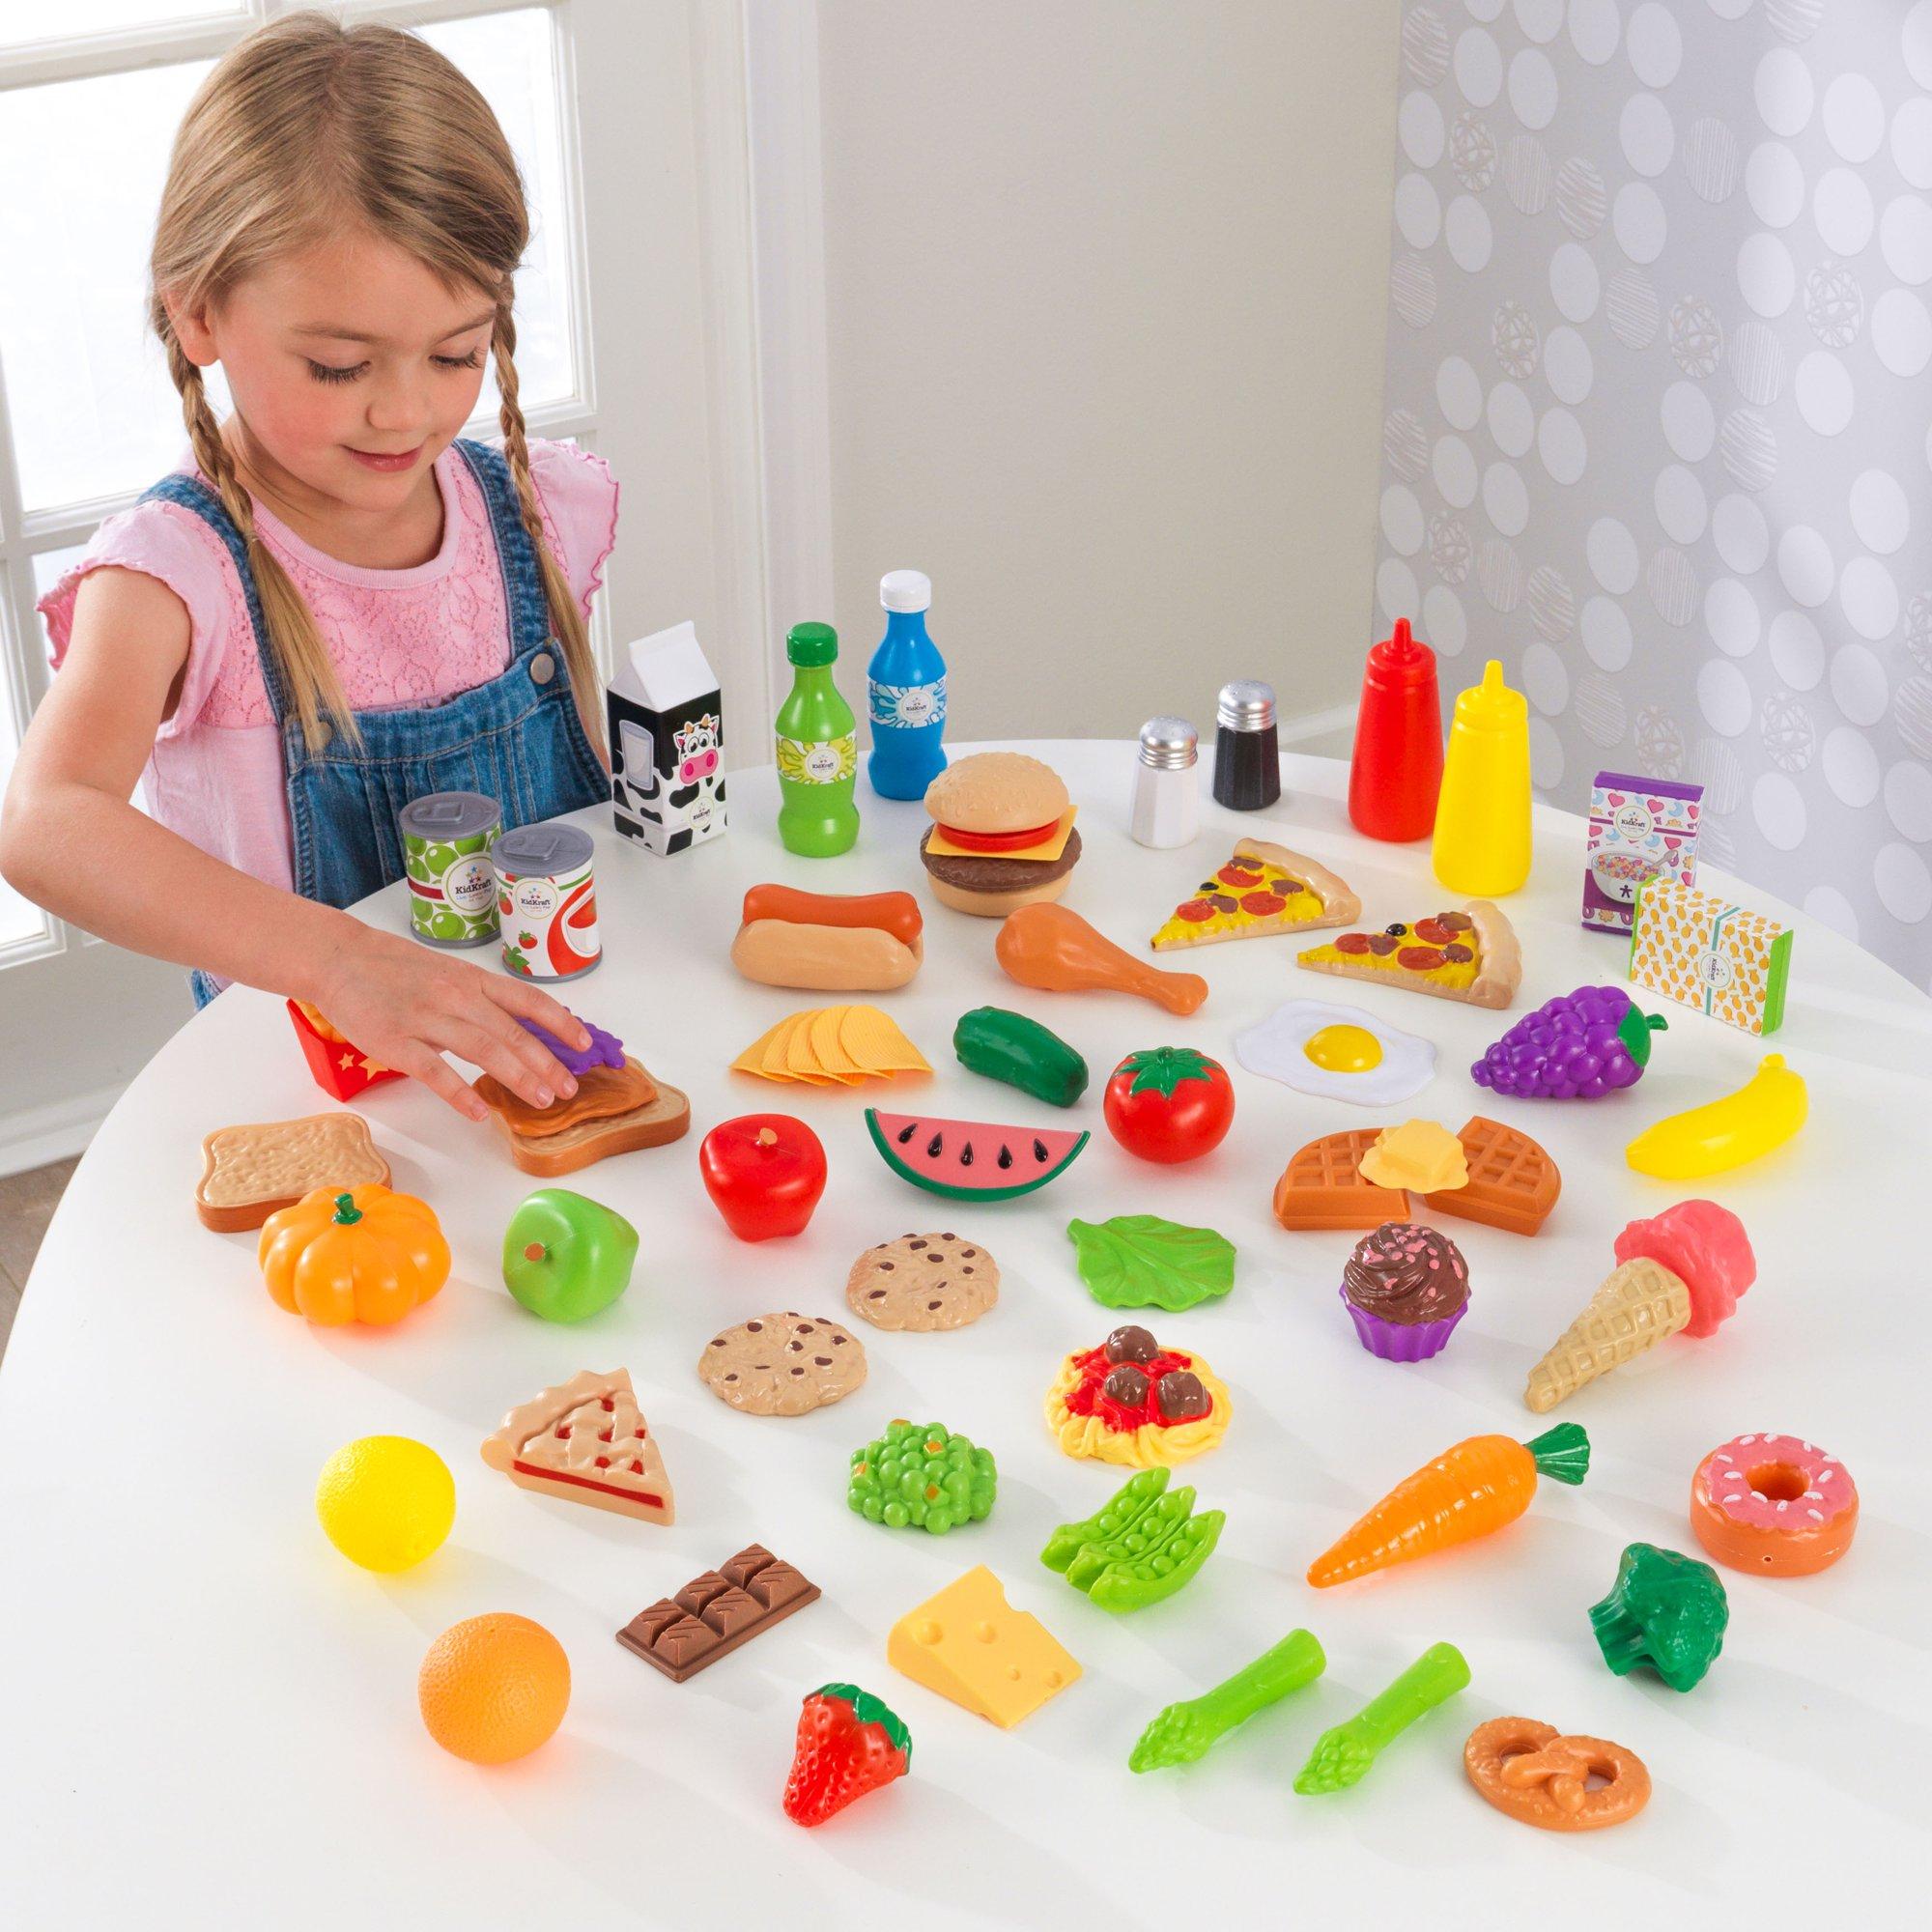 Buy Kidkraft 65 Pc Play Food Set Cheapest Kidkraft Deals And Reviews